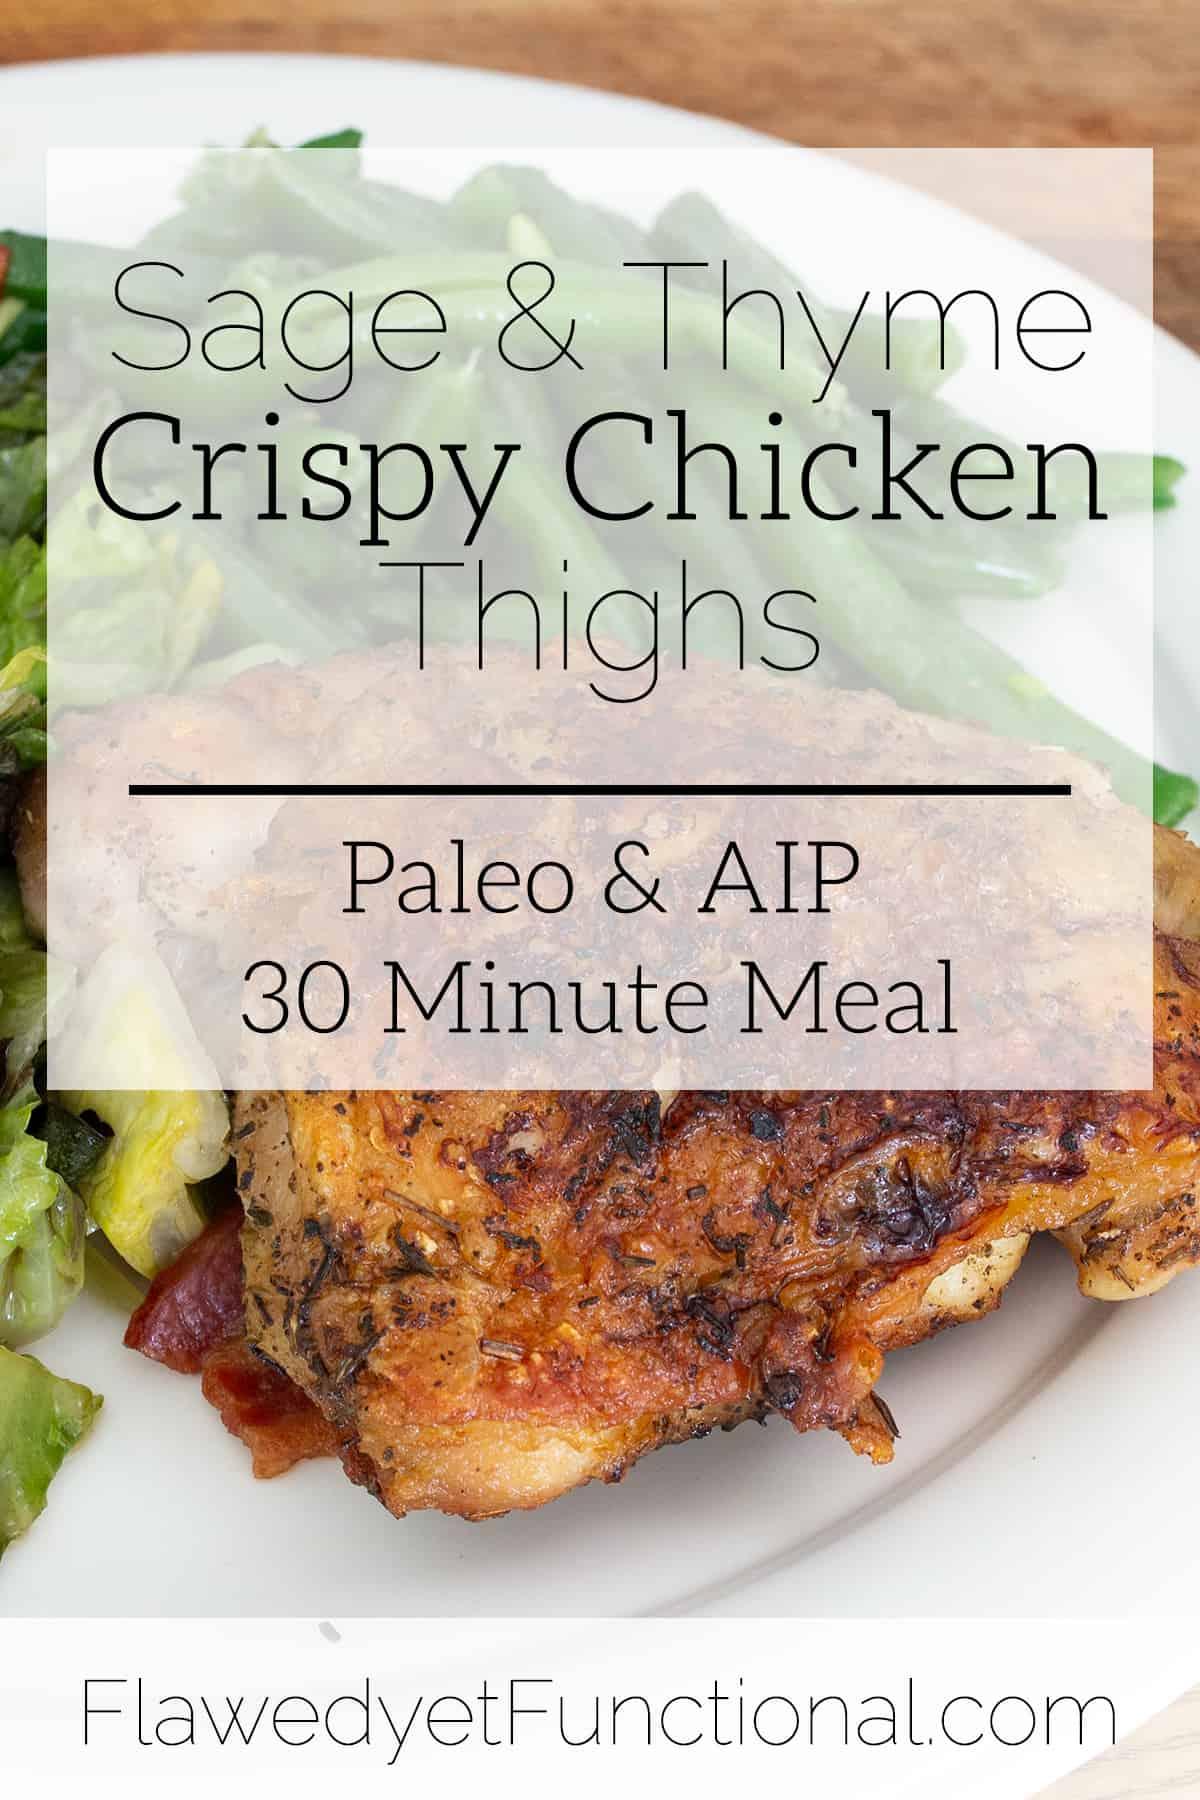 Sage & Thyme Crispy Chicken Thighs | AIP & Paleo Recipe